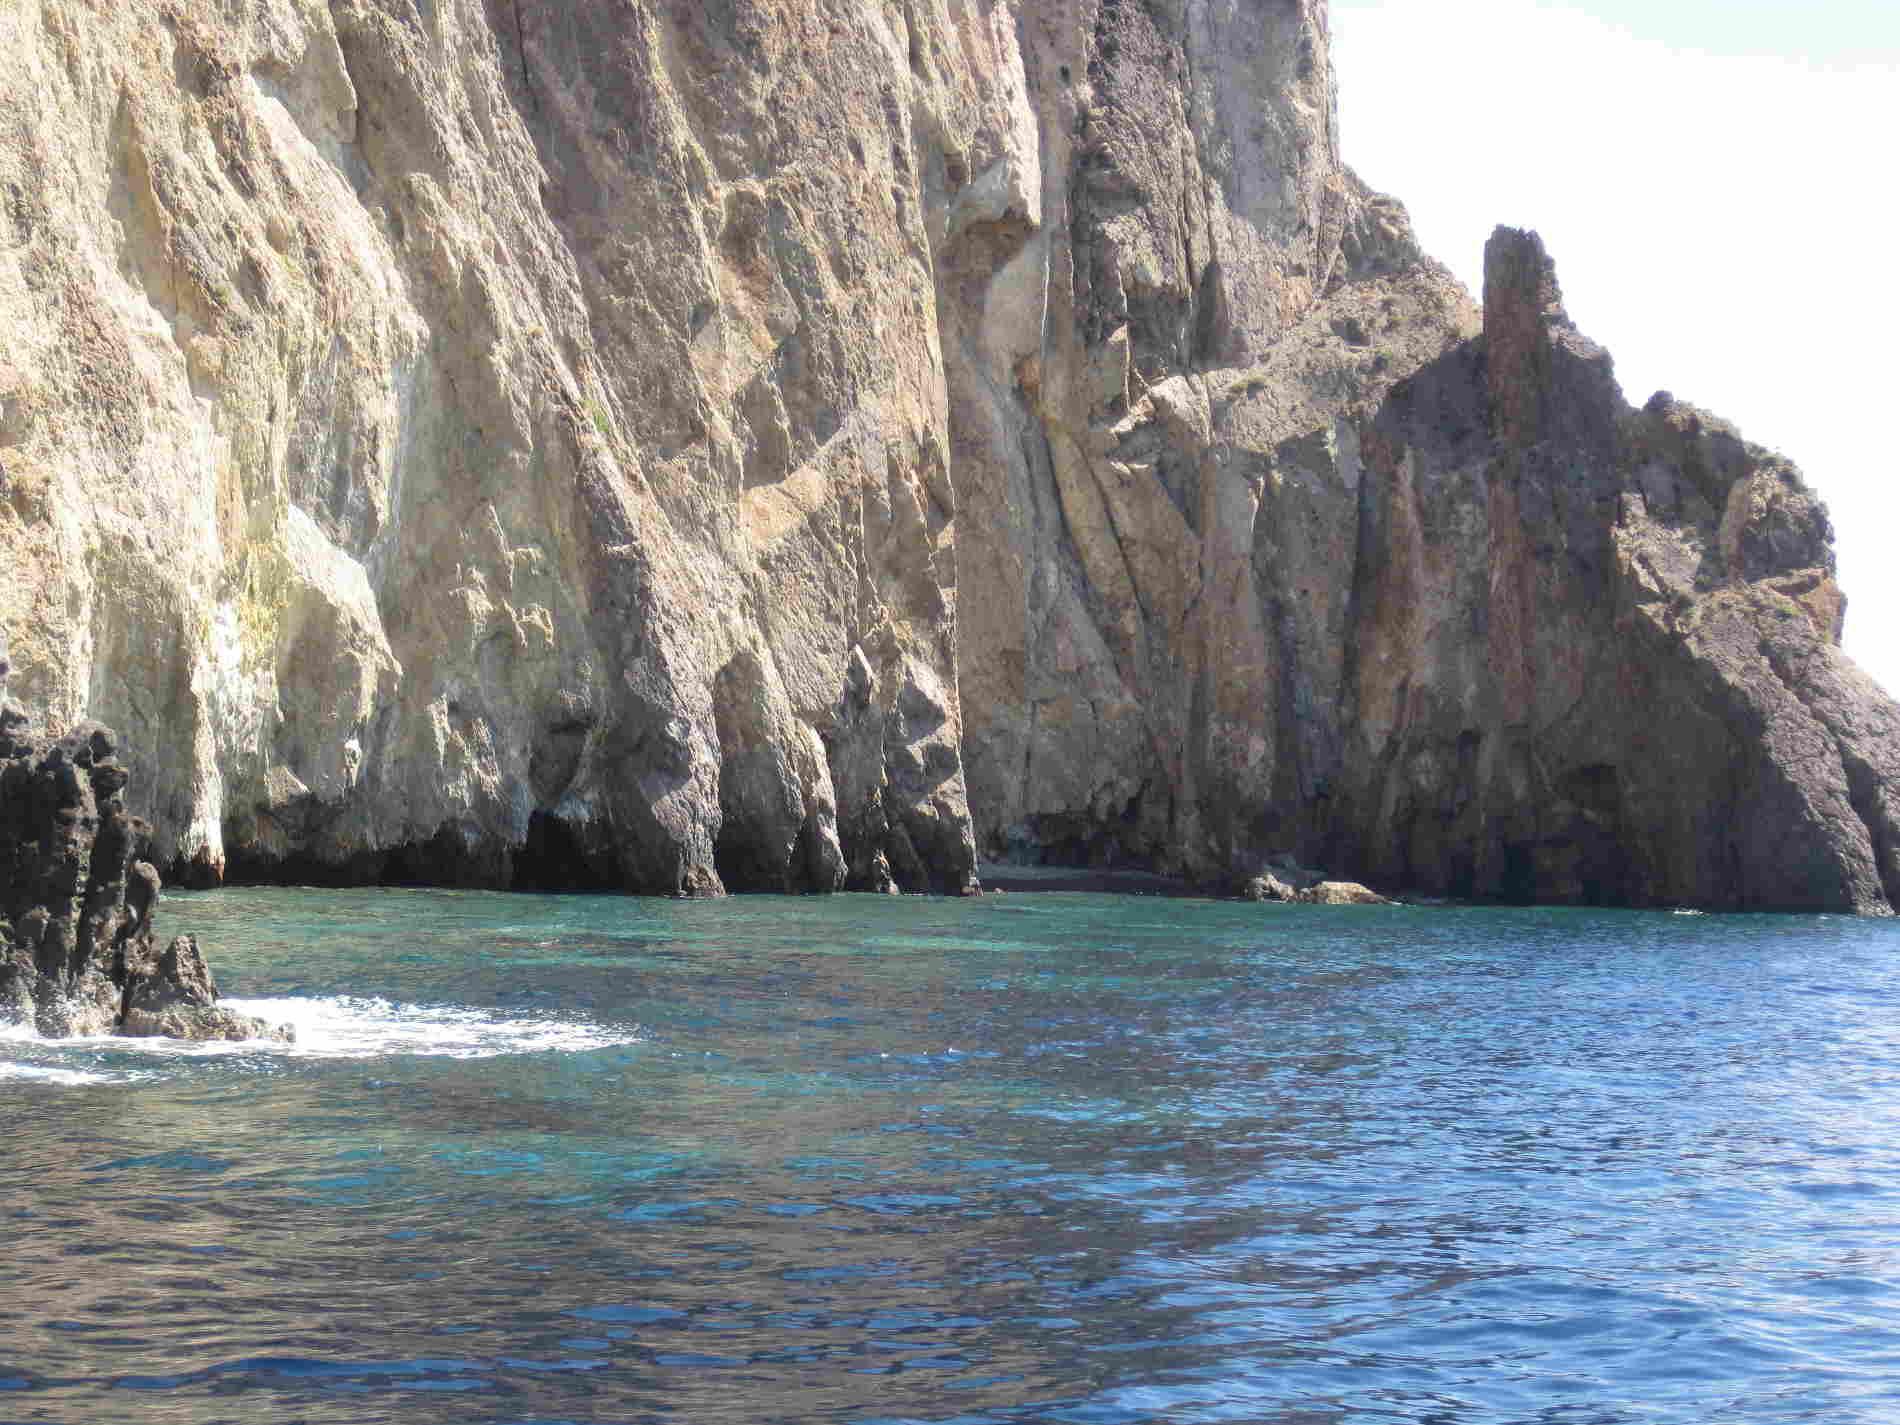 Baie dell'Isola di Panarea -guida alle 7 Isole Eolie Messina Italia